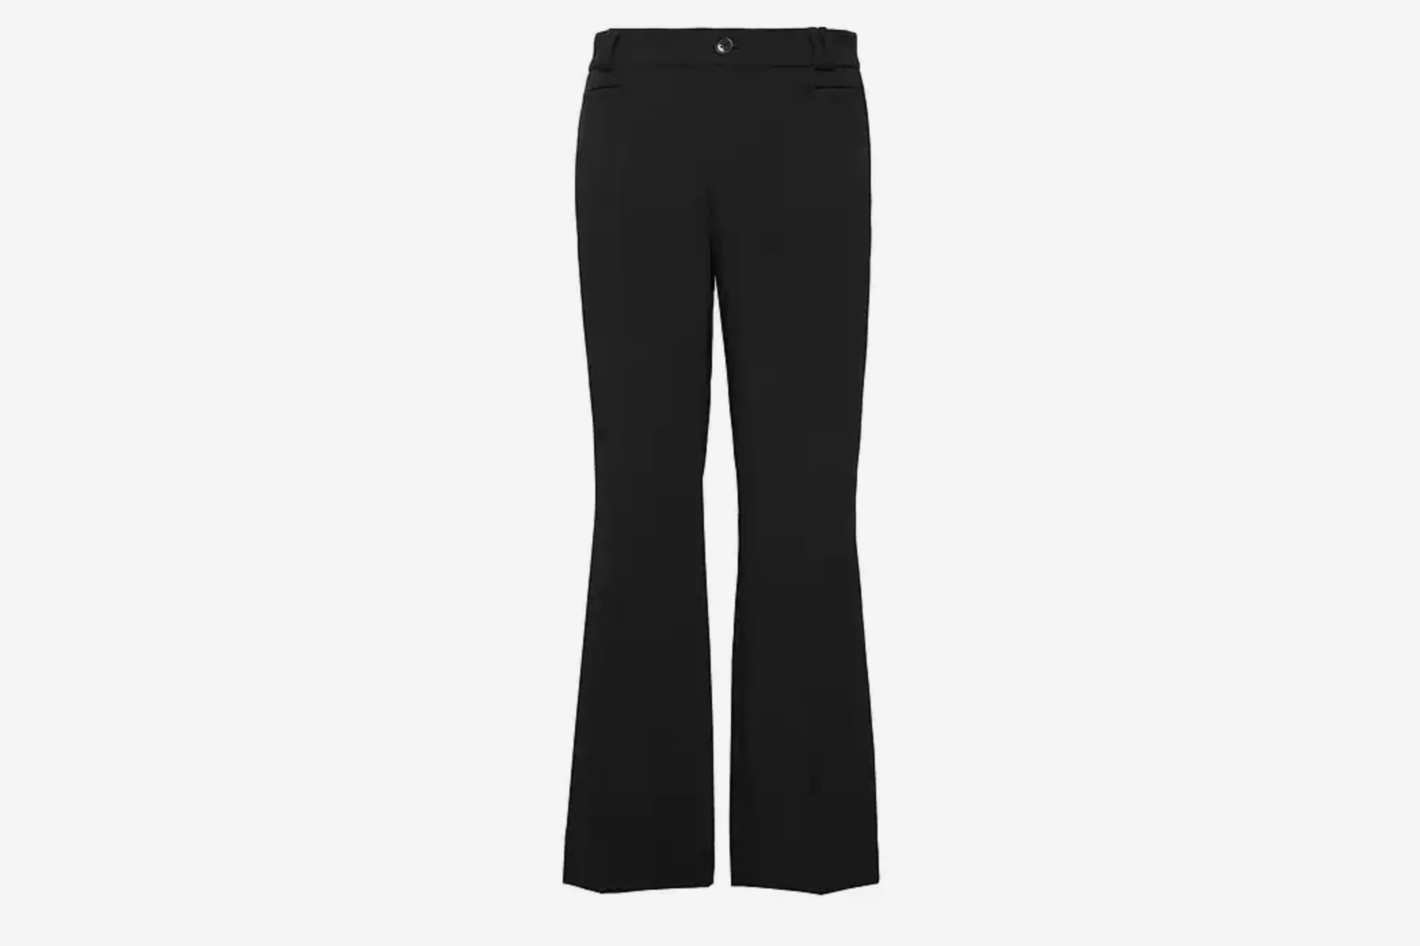 Logan Trouser-Fit Cropped Bi-Stretch Pant